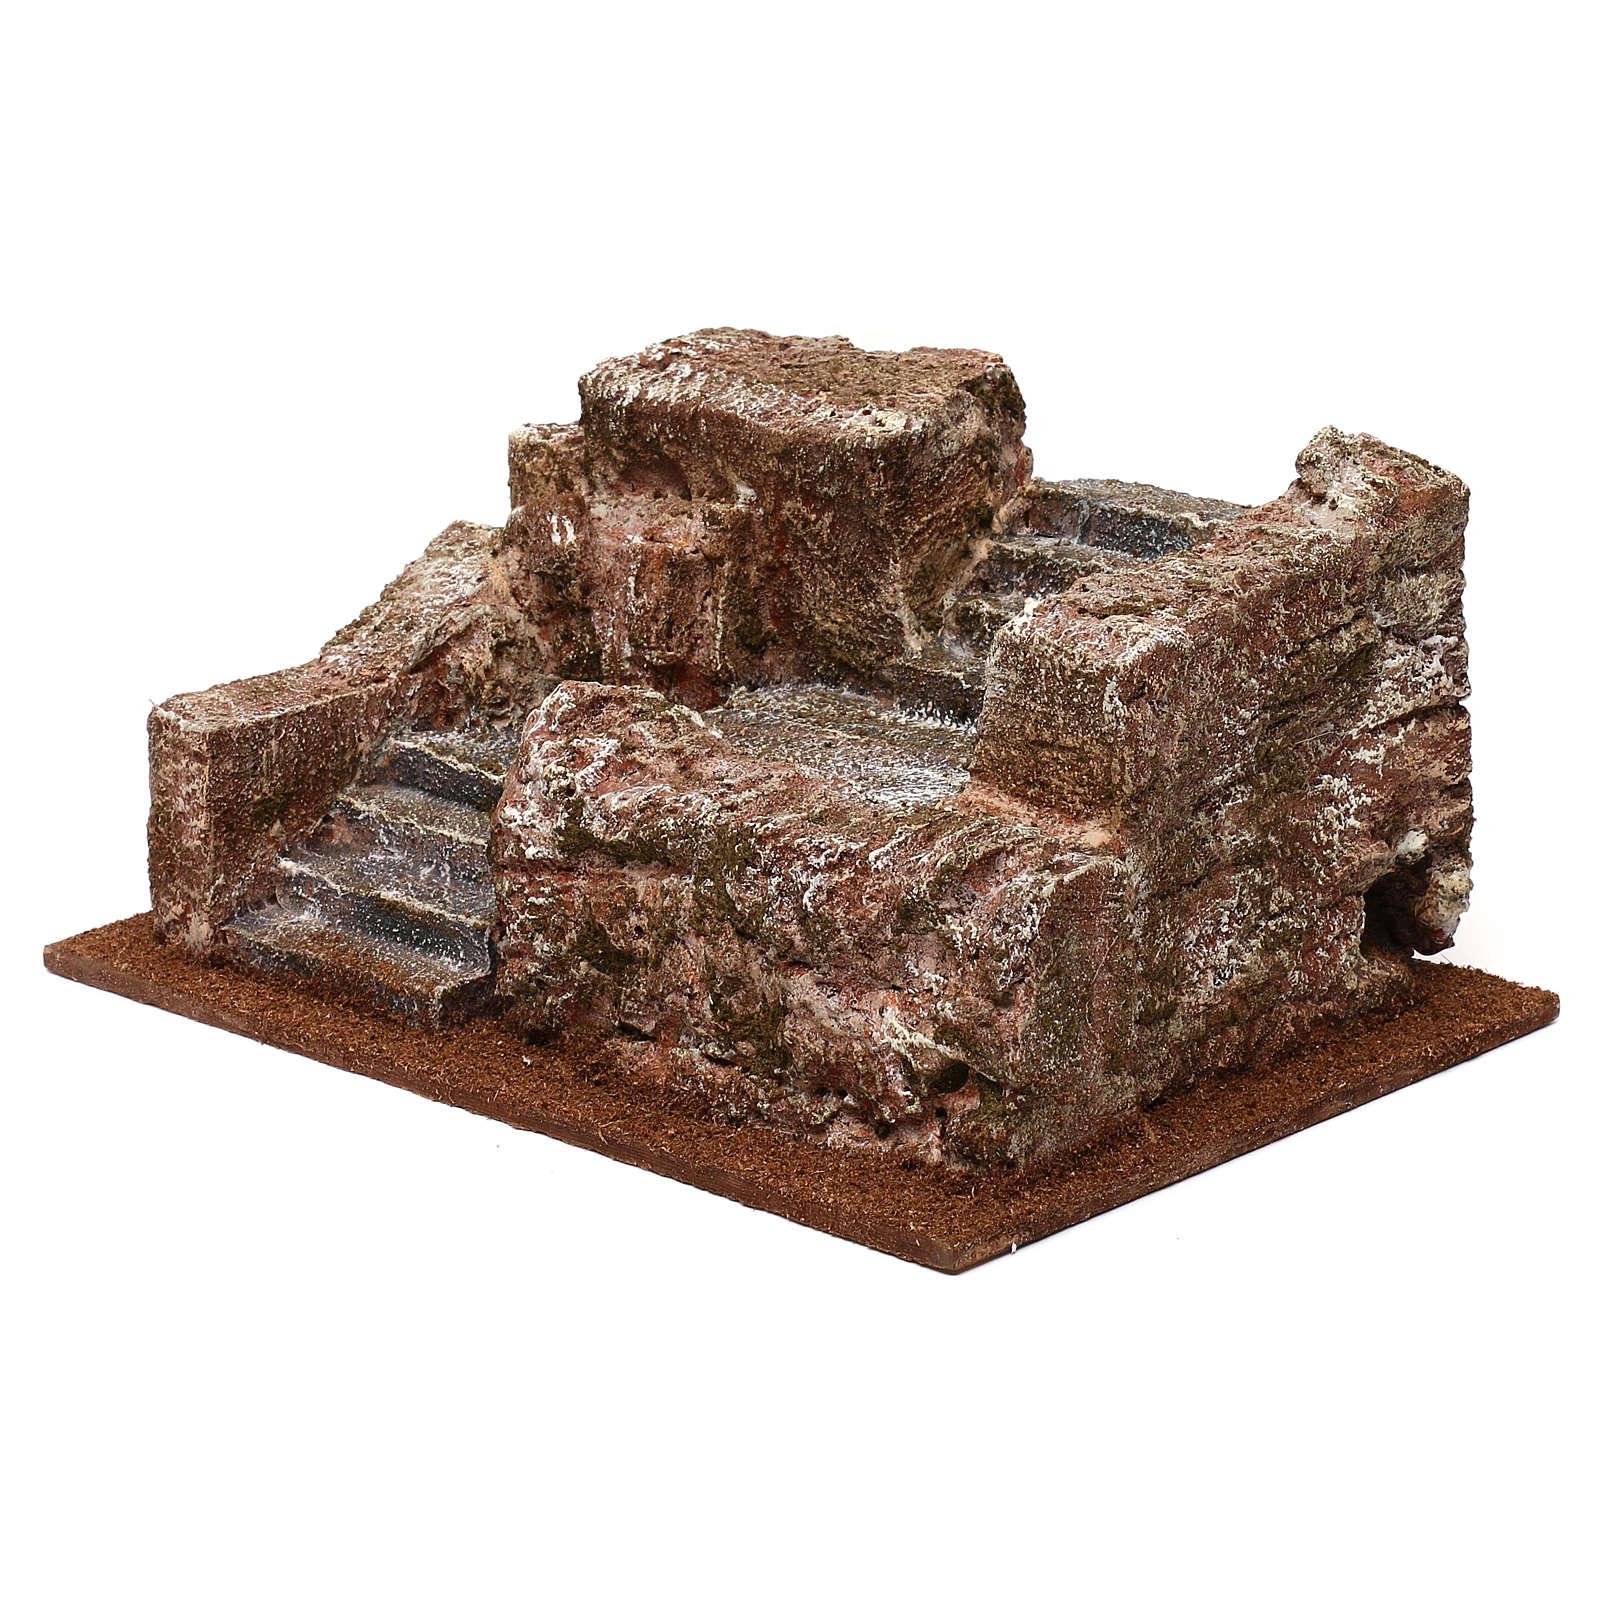 Nativity scene stone staircase 10x25x15 cm 4